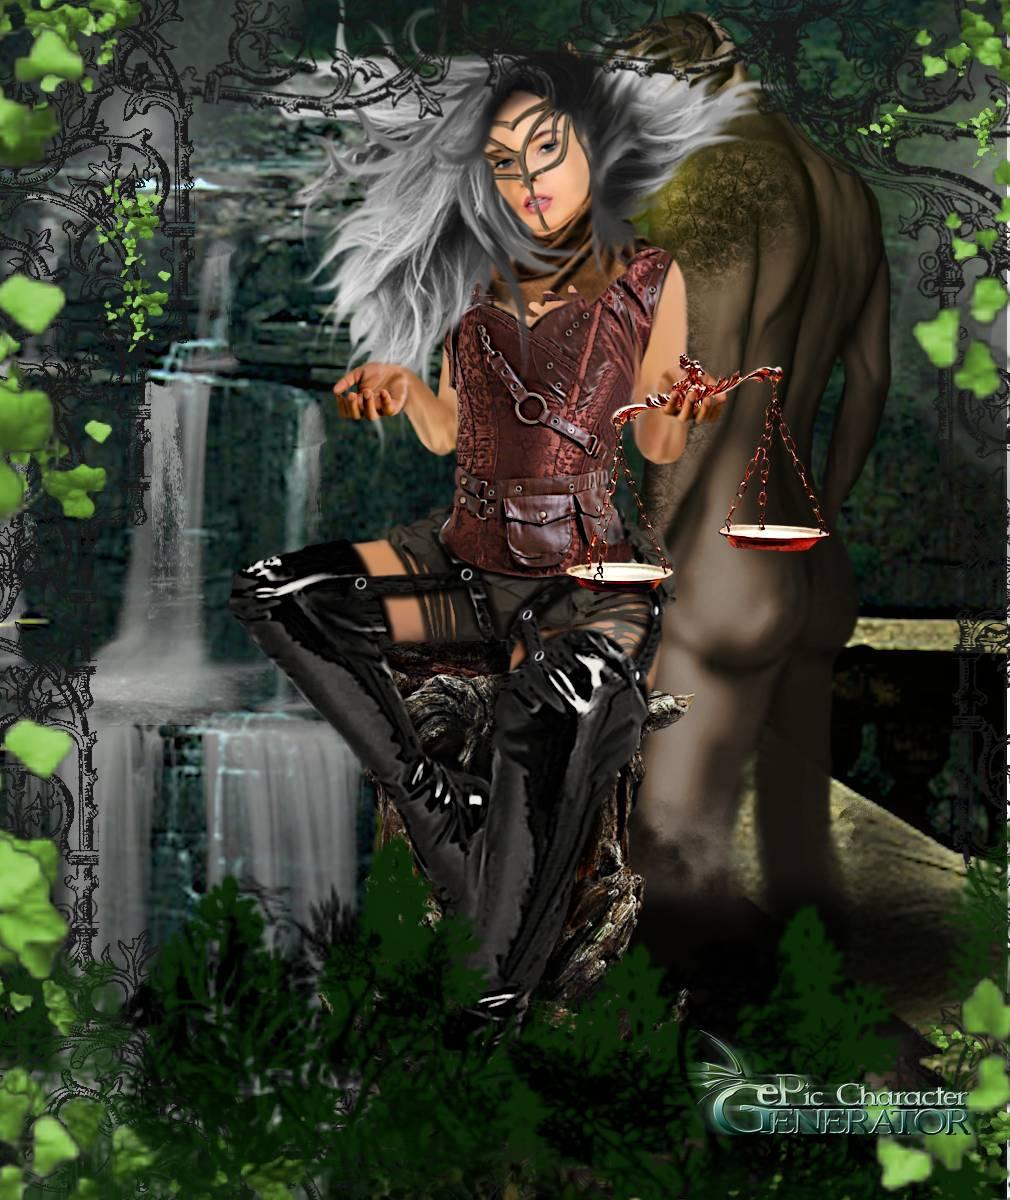 ePic Character Generator Season 3 Throne Lady Screenshot 13